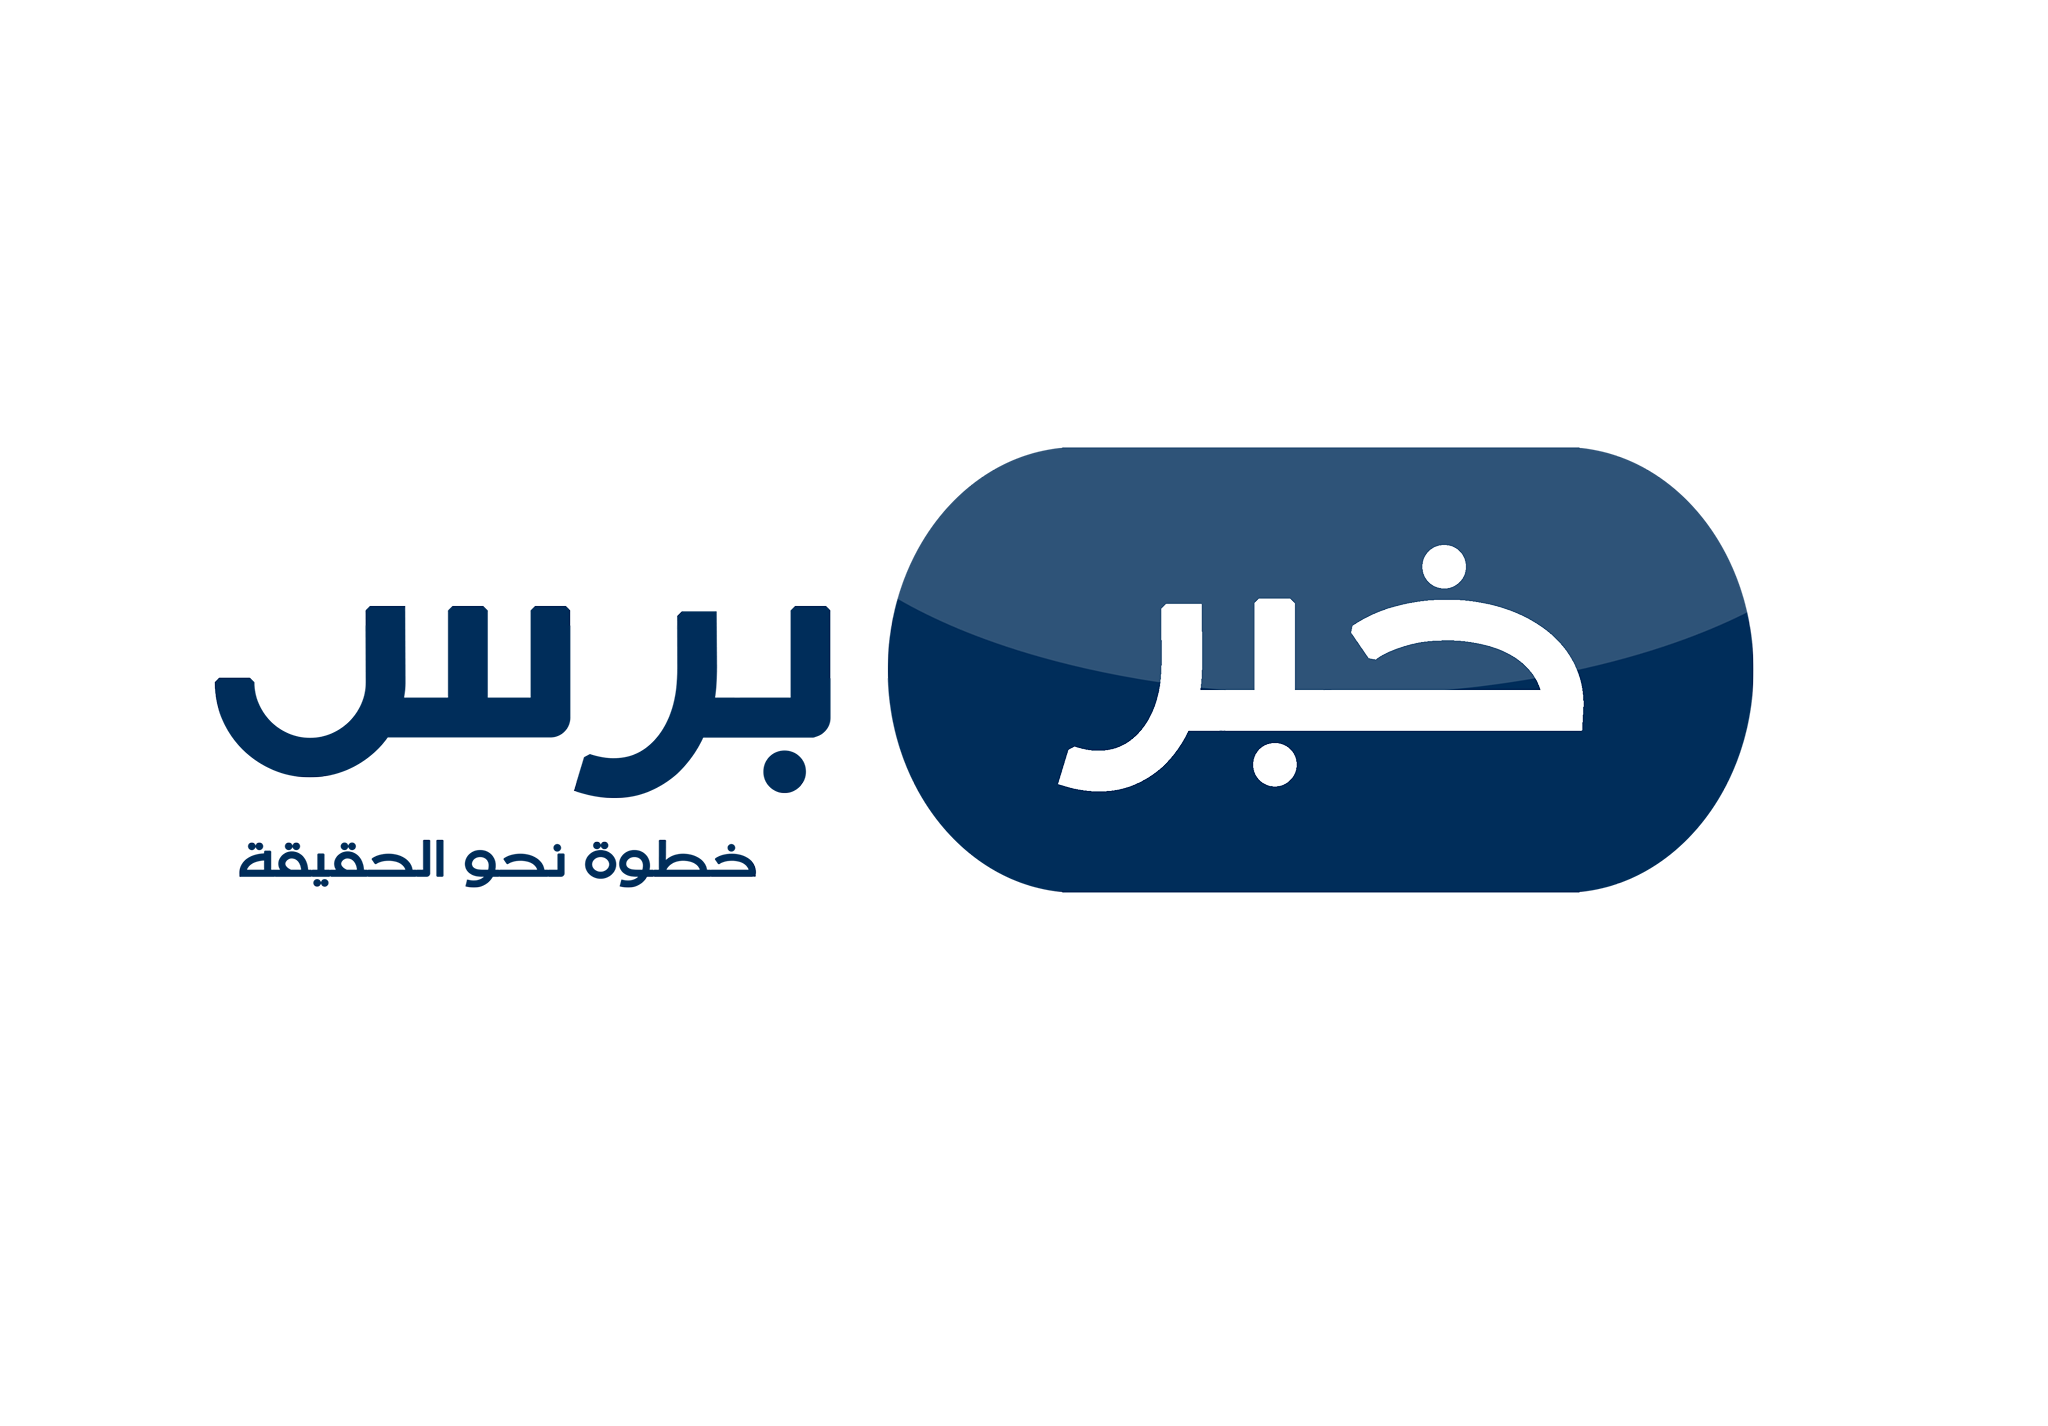 أحمد حجّاب